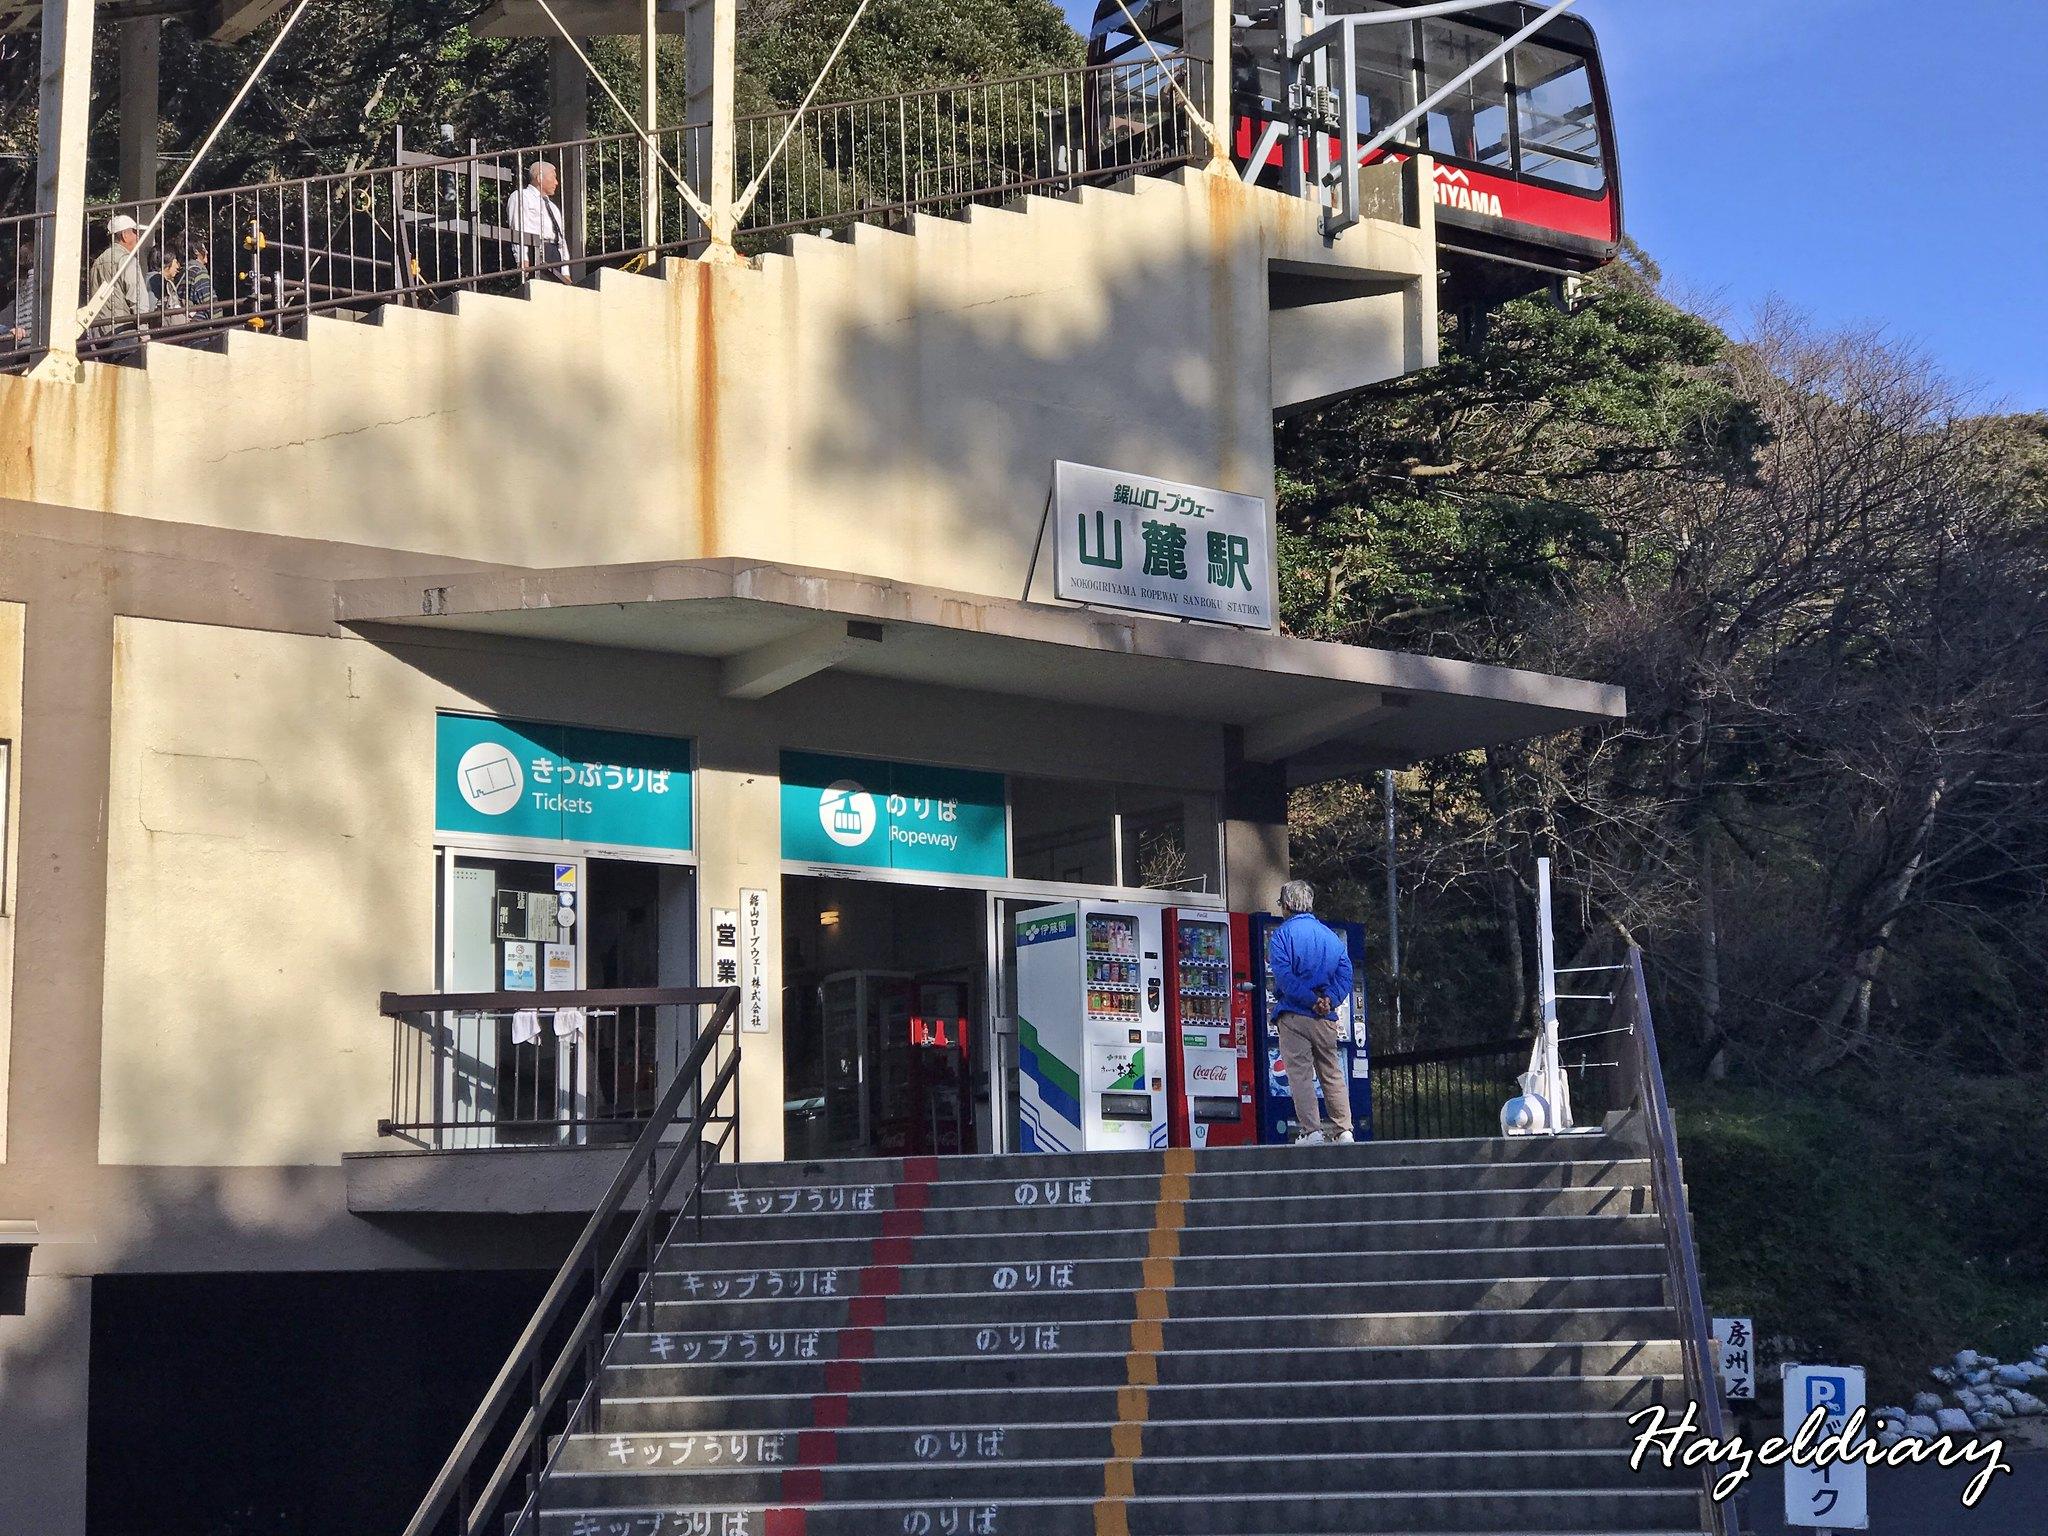 Hanakamaya